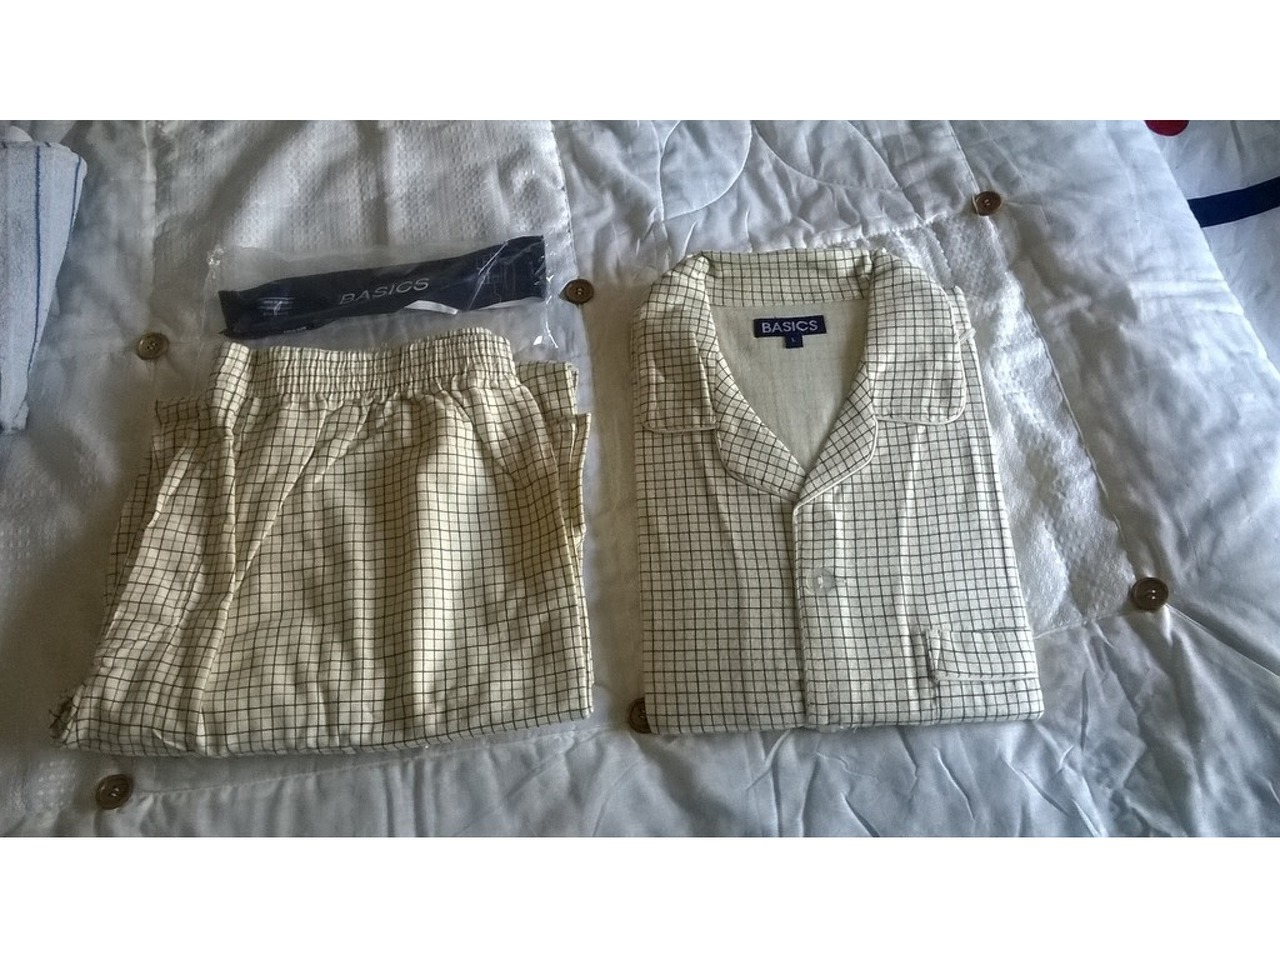 Pijamas (segunda mão) - 1/12